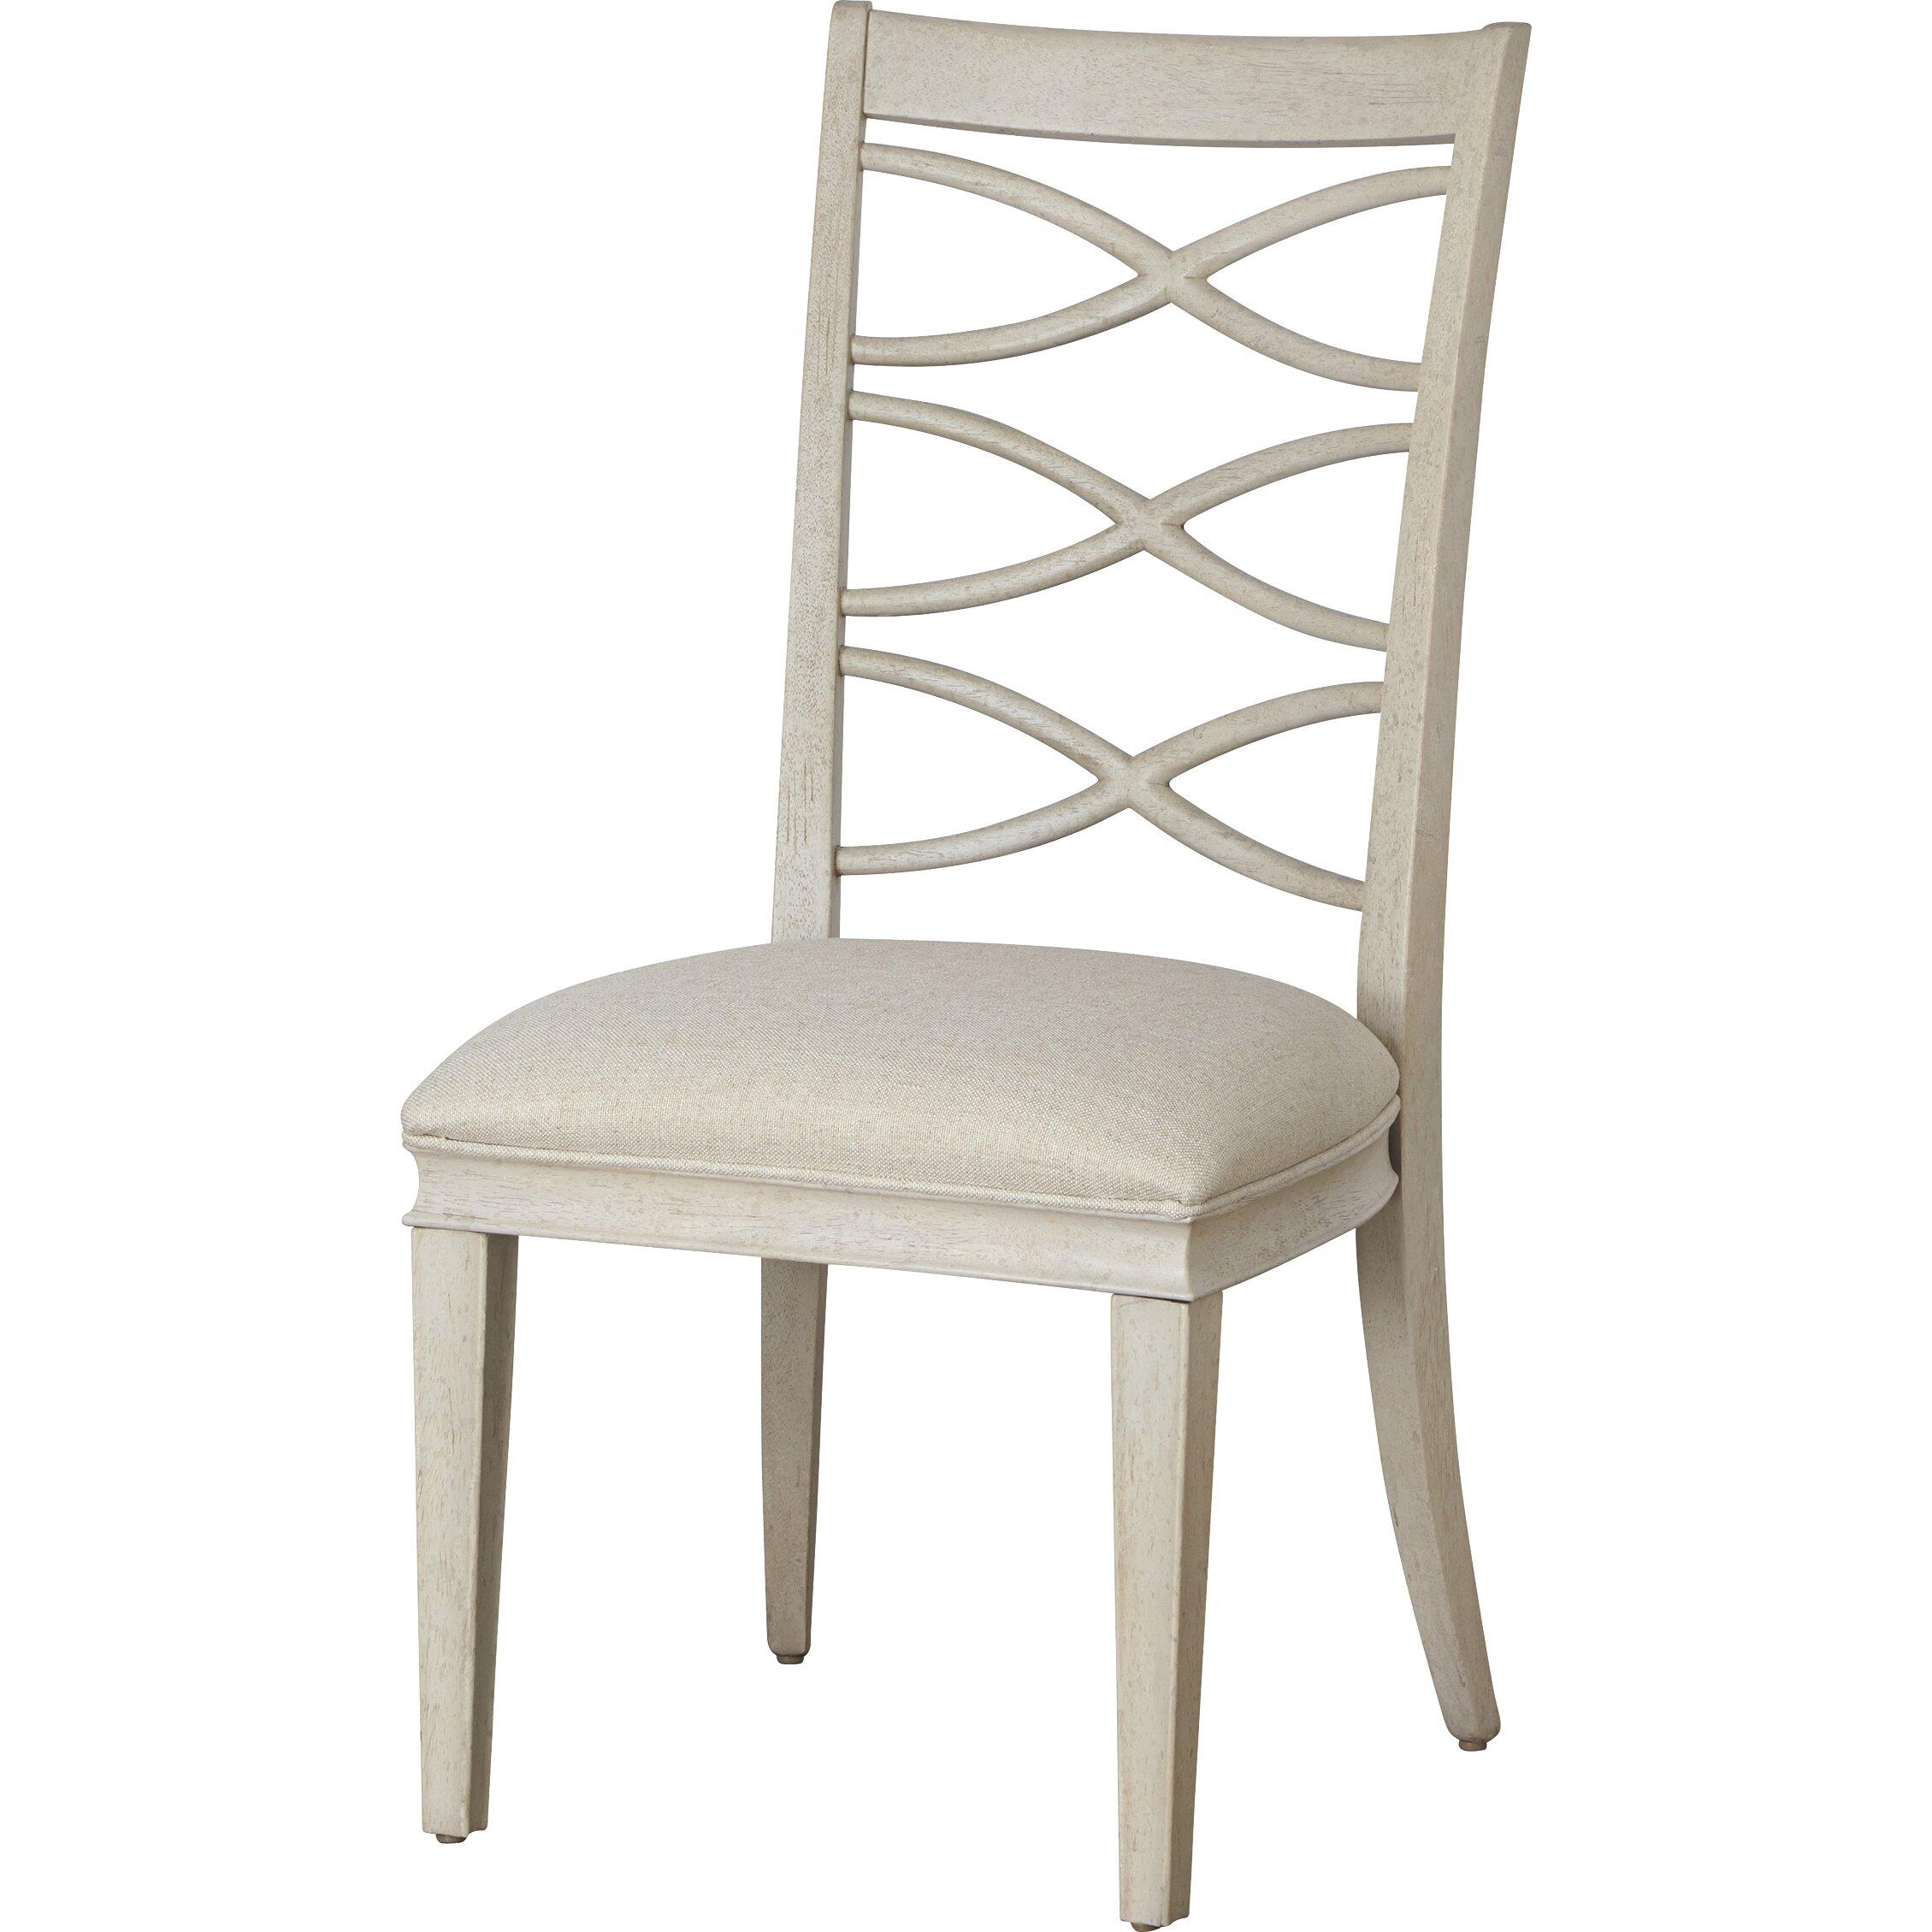 Universal furniture california 7 piece dining set for Furniture 7 credit reviews